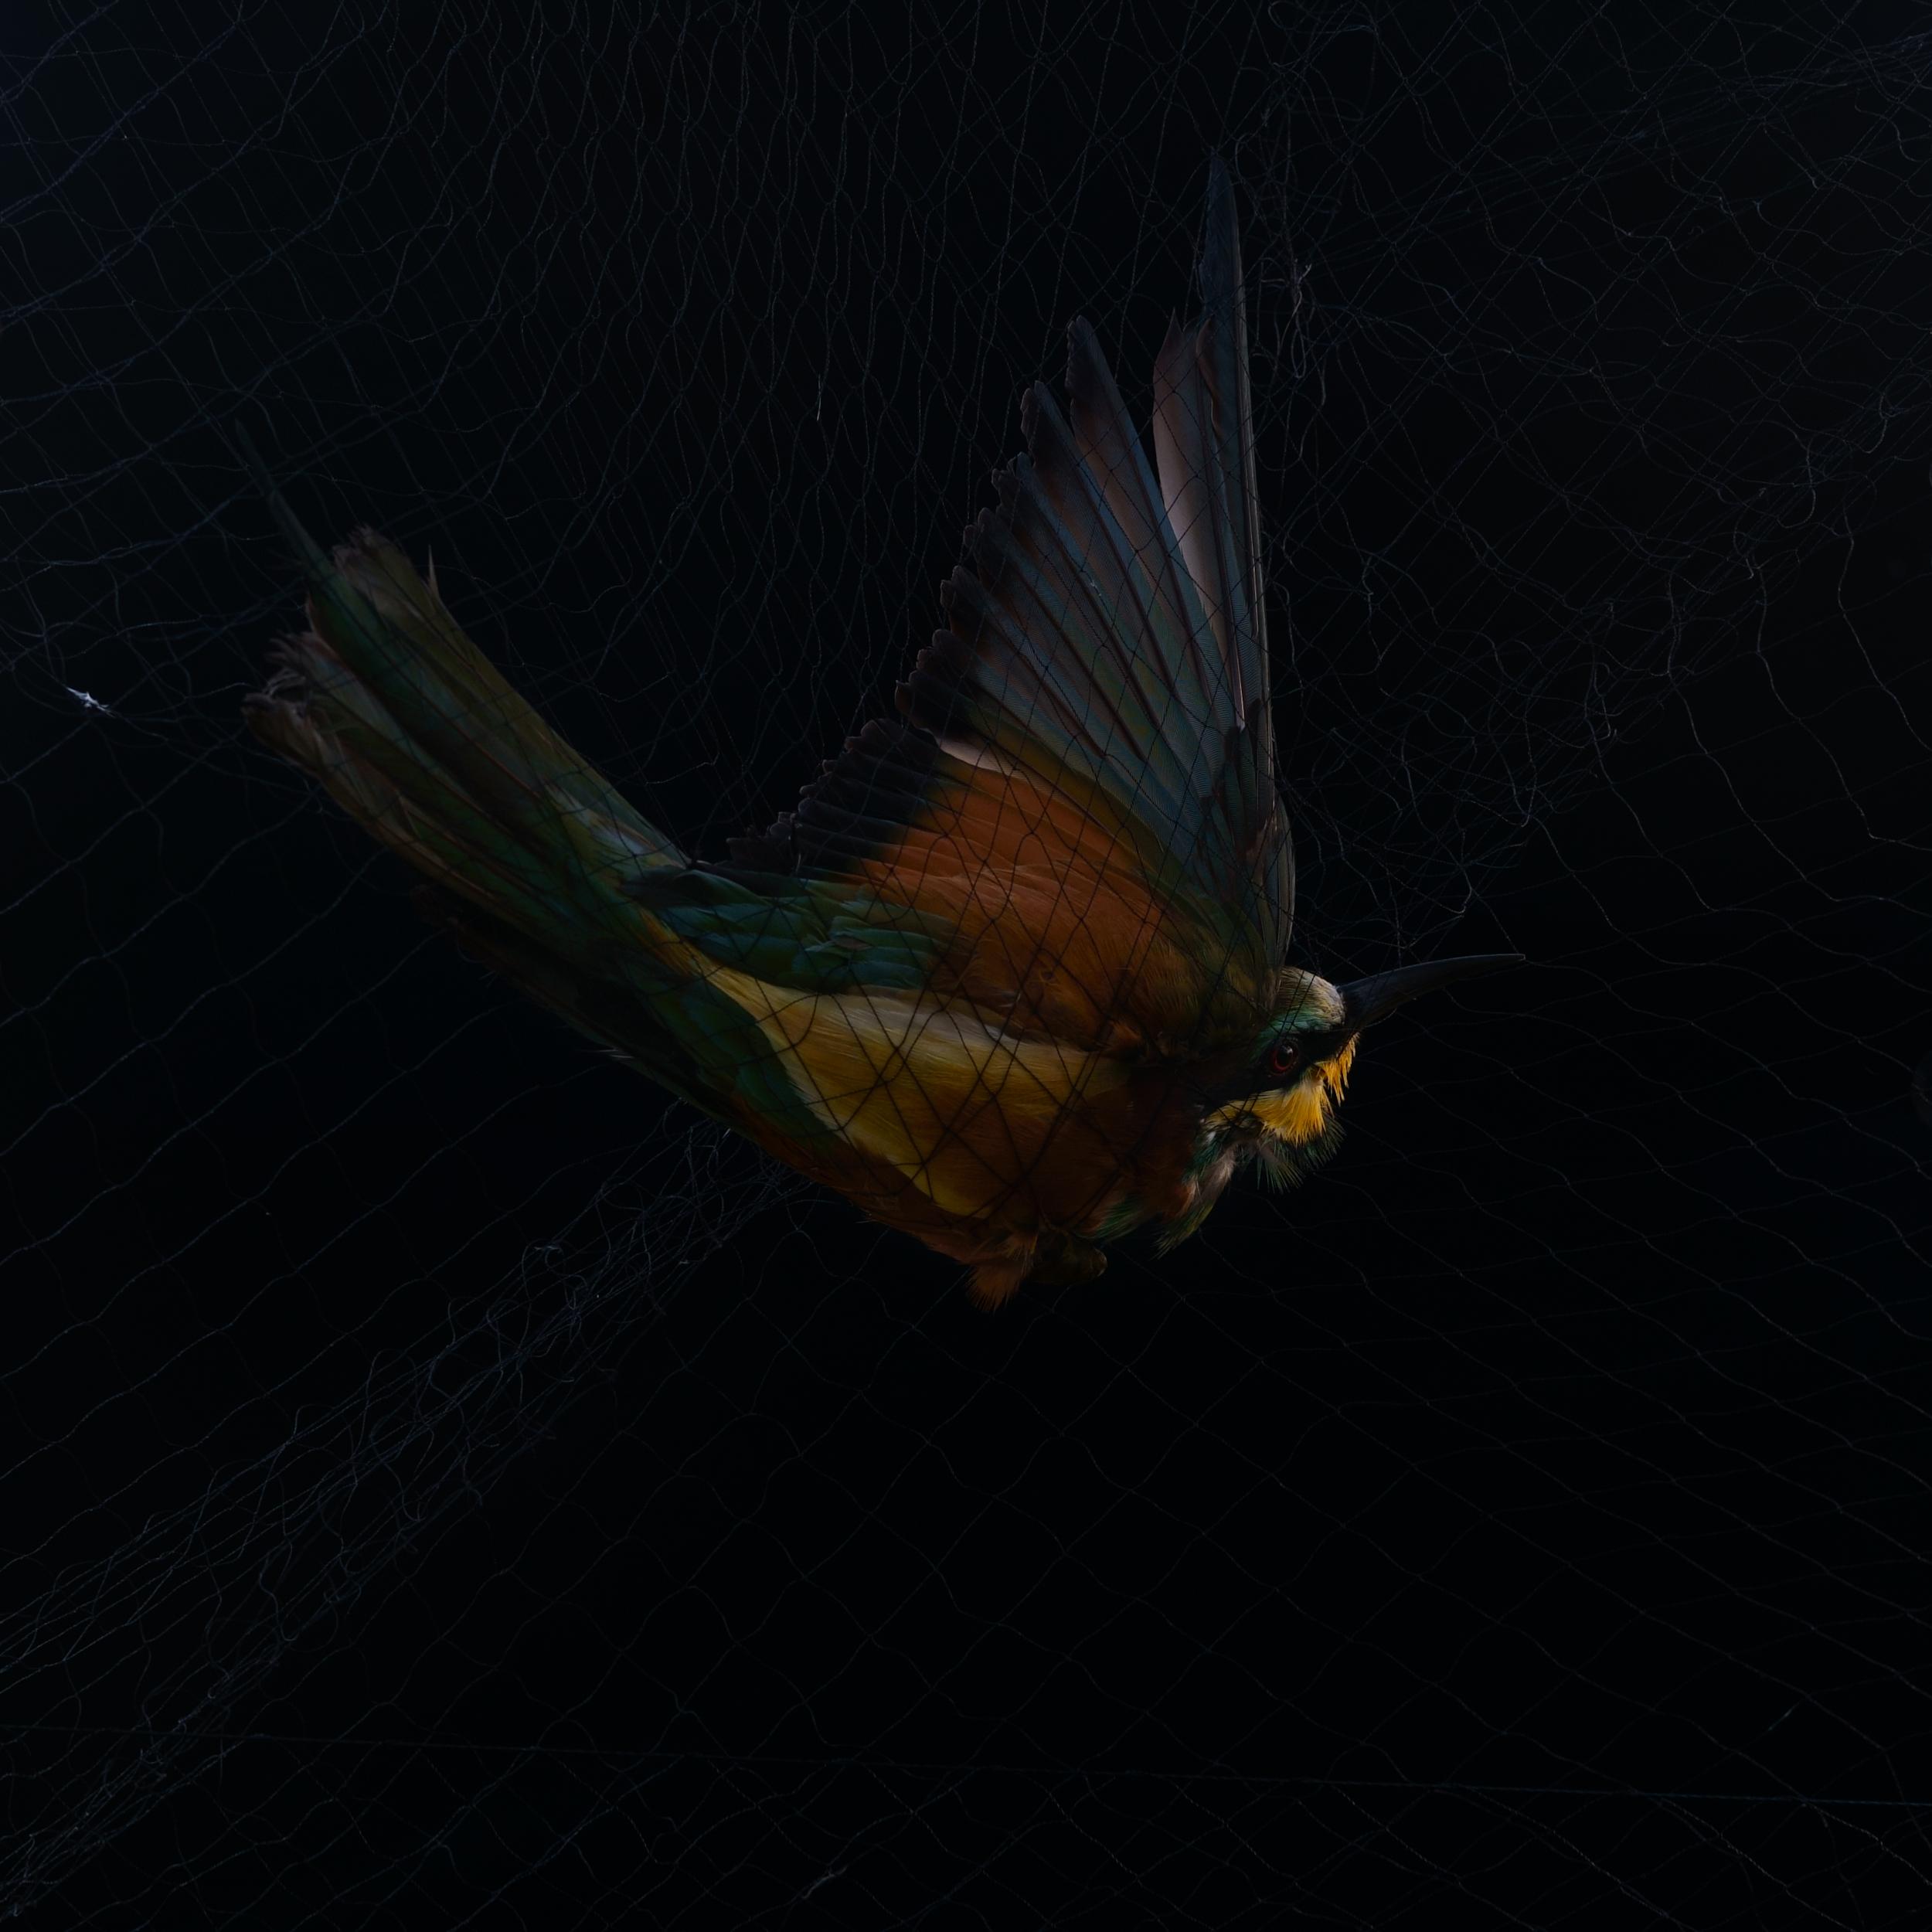 European bee-eater 'Merops apiaster'